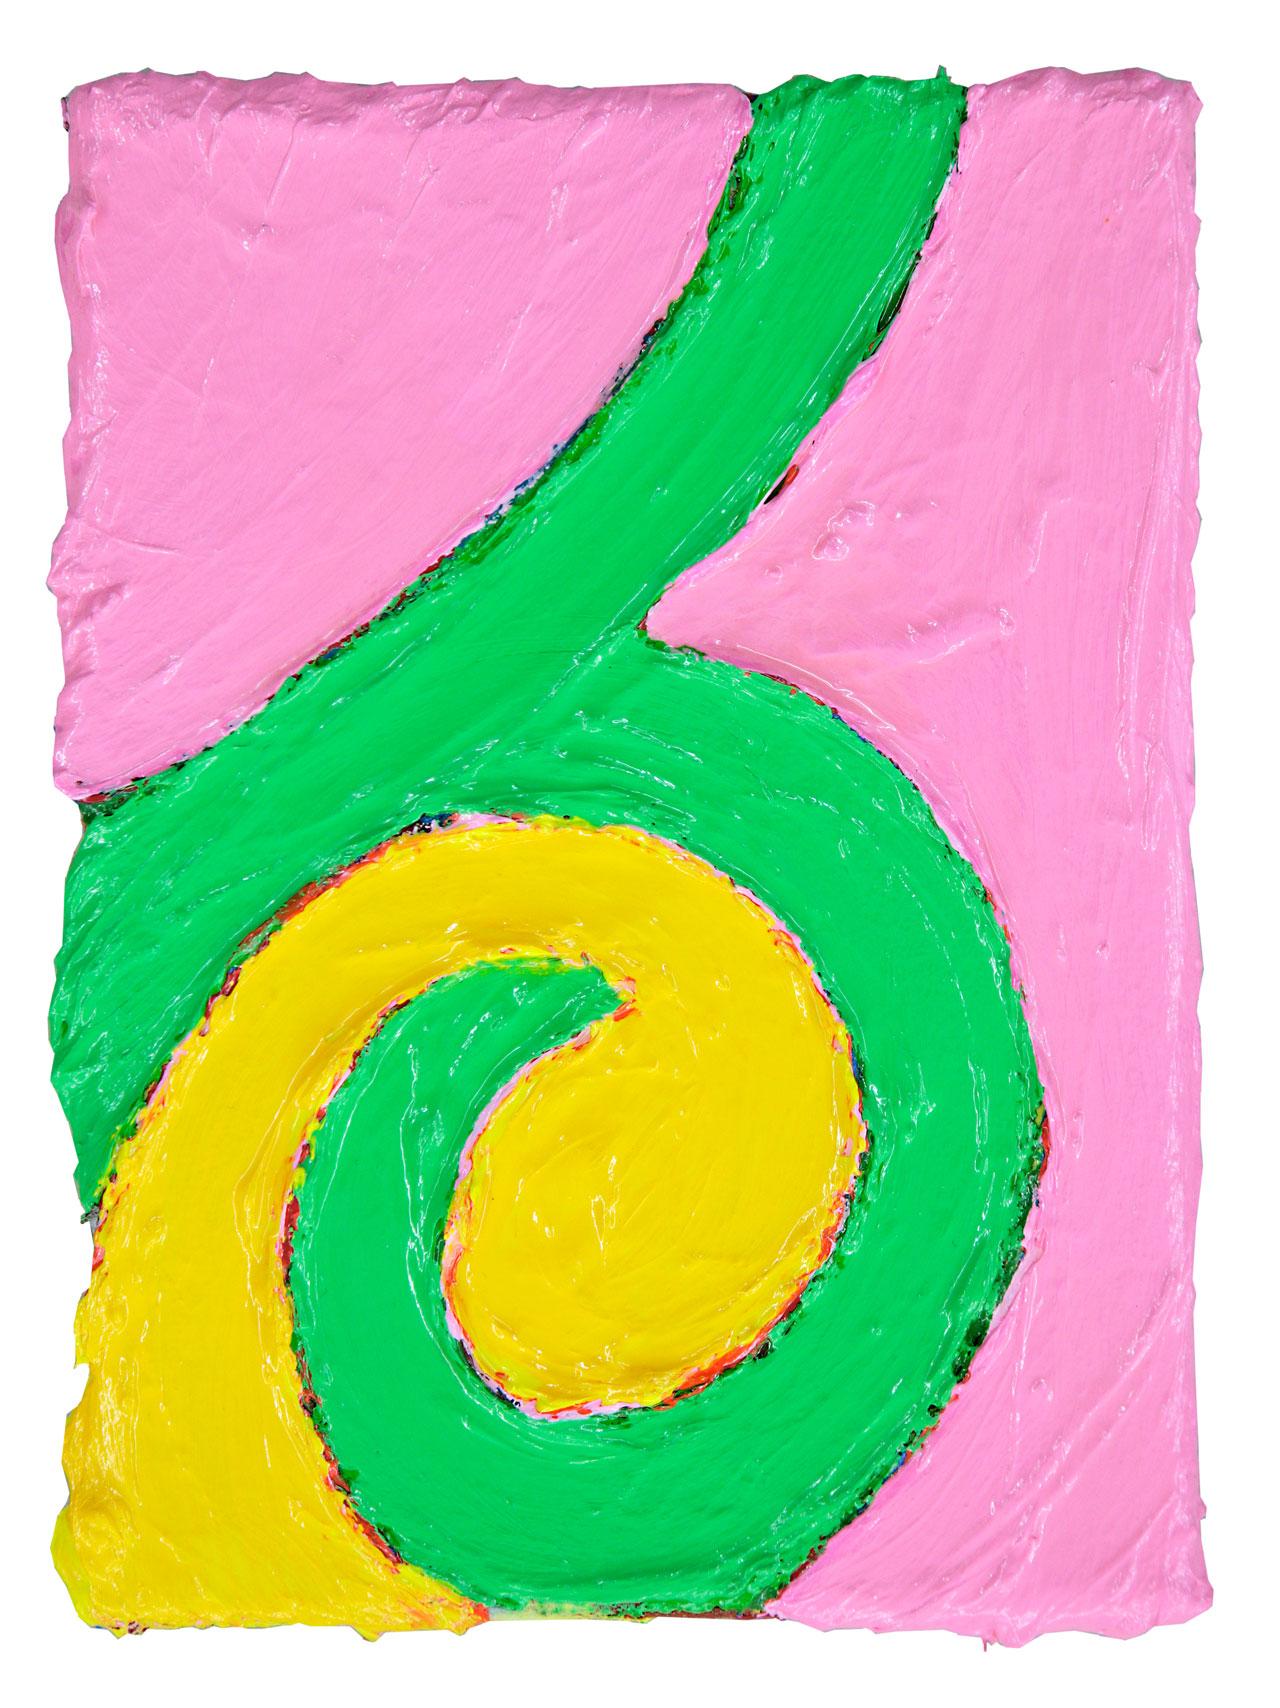 # 5 | SAPONARIA | 2011 © Kerstin Jeckel | MEMORY-PROJEKT # 107